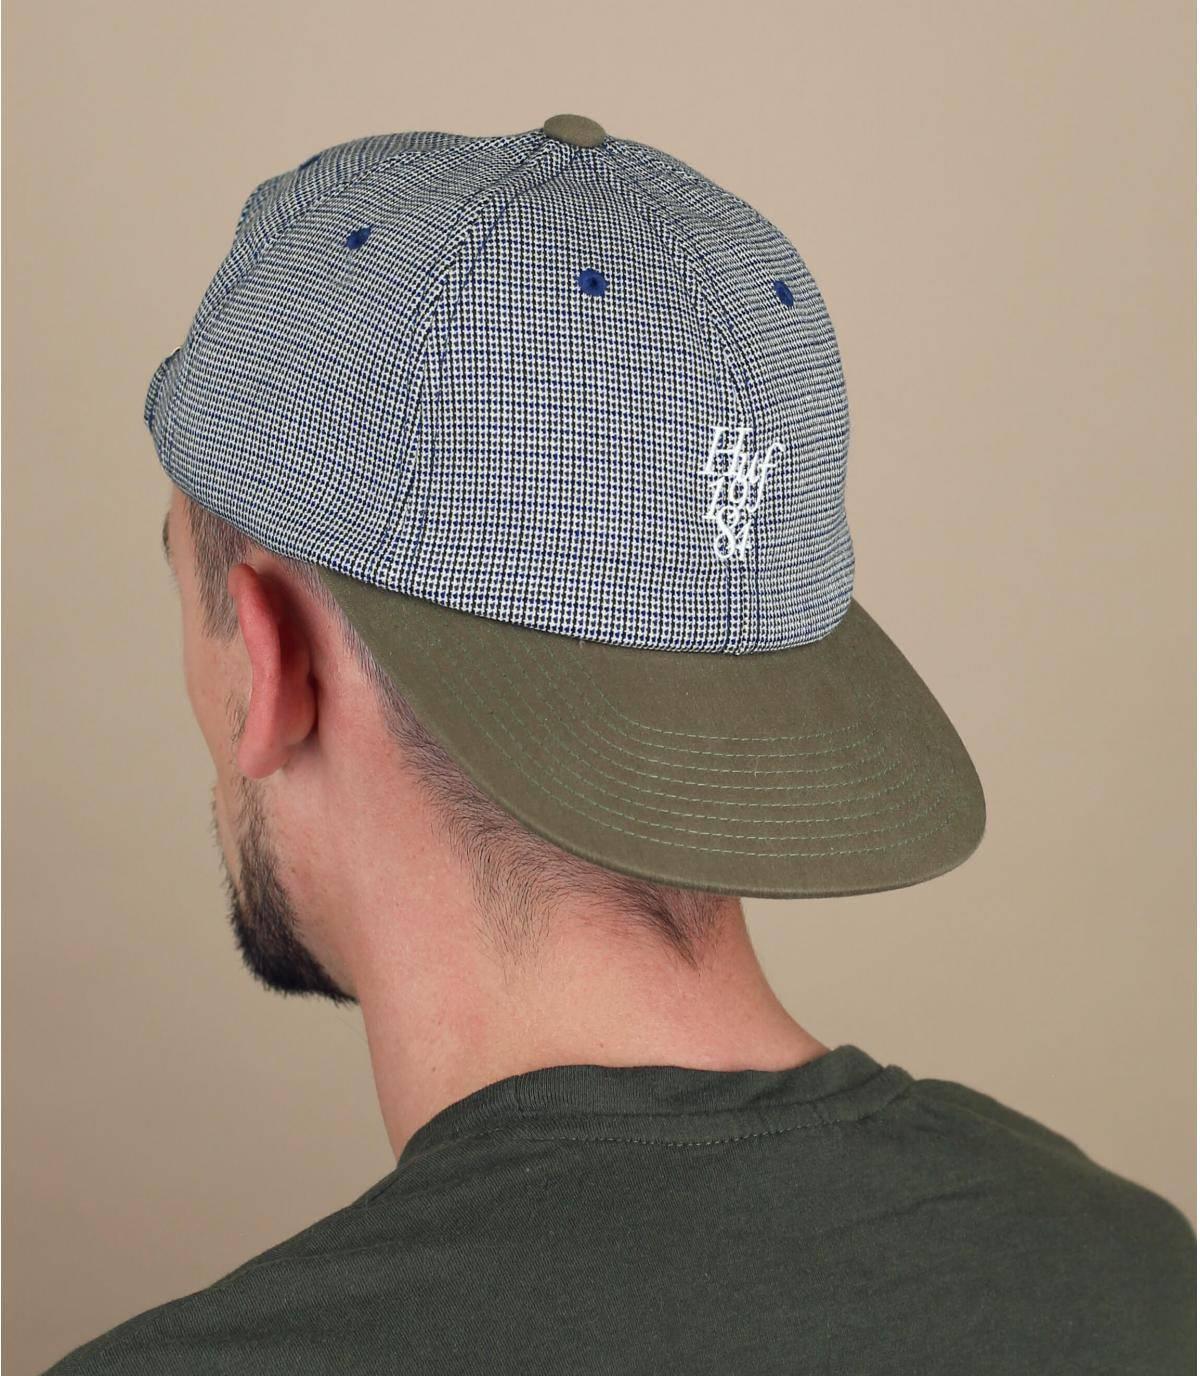 cappellino Huf pied-de-poule